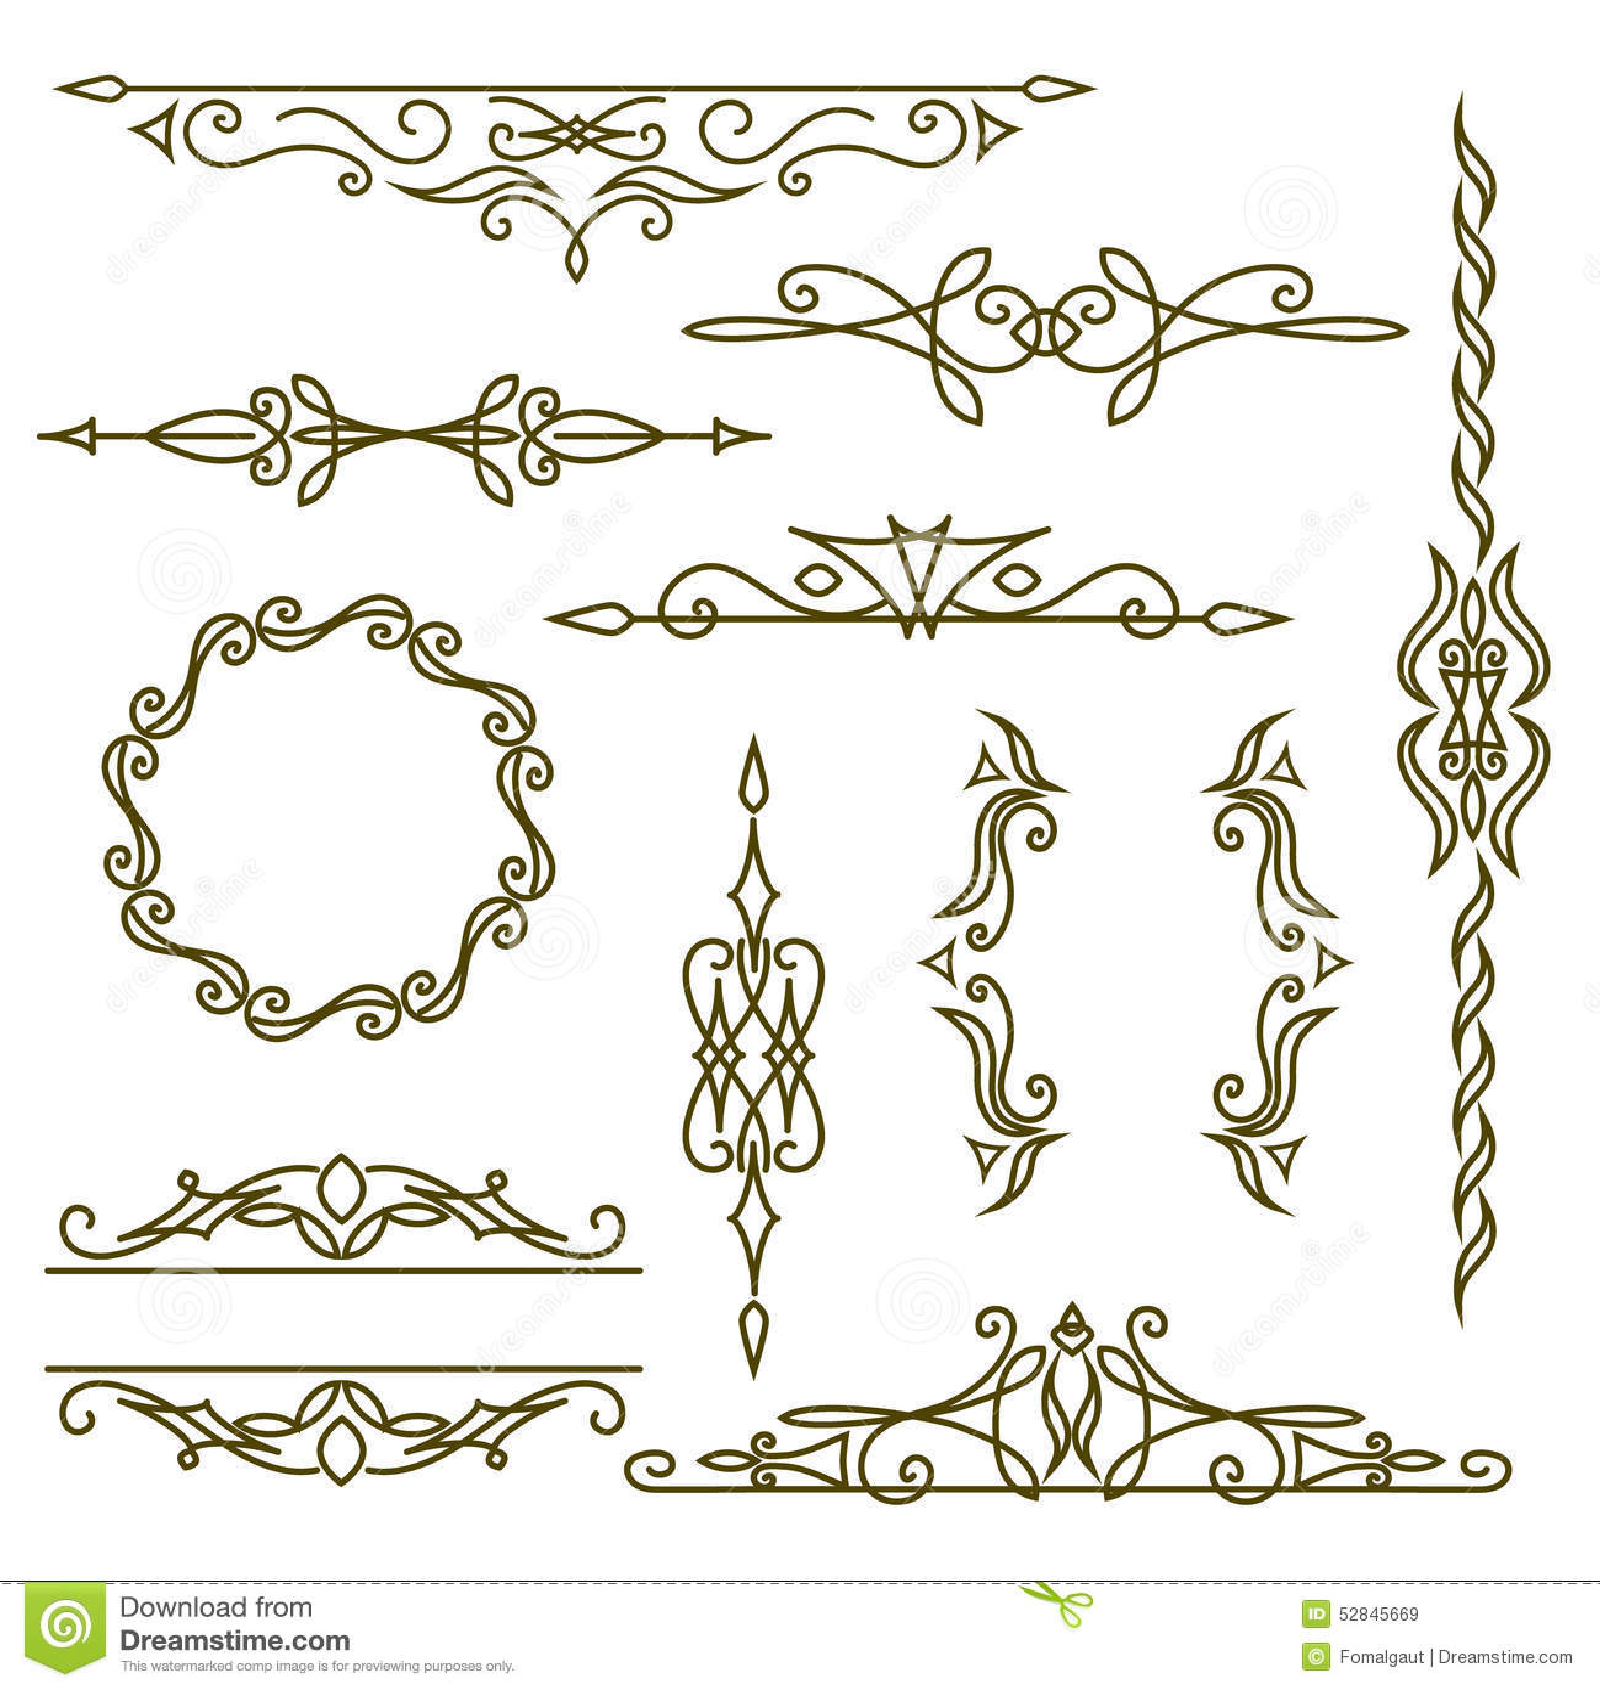 Elegant lines - photo#14